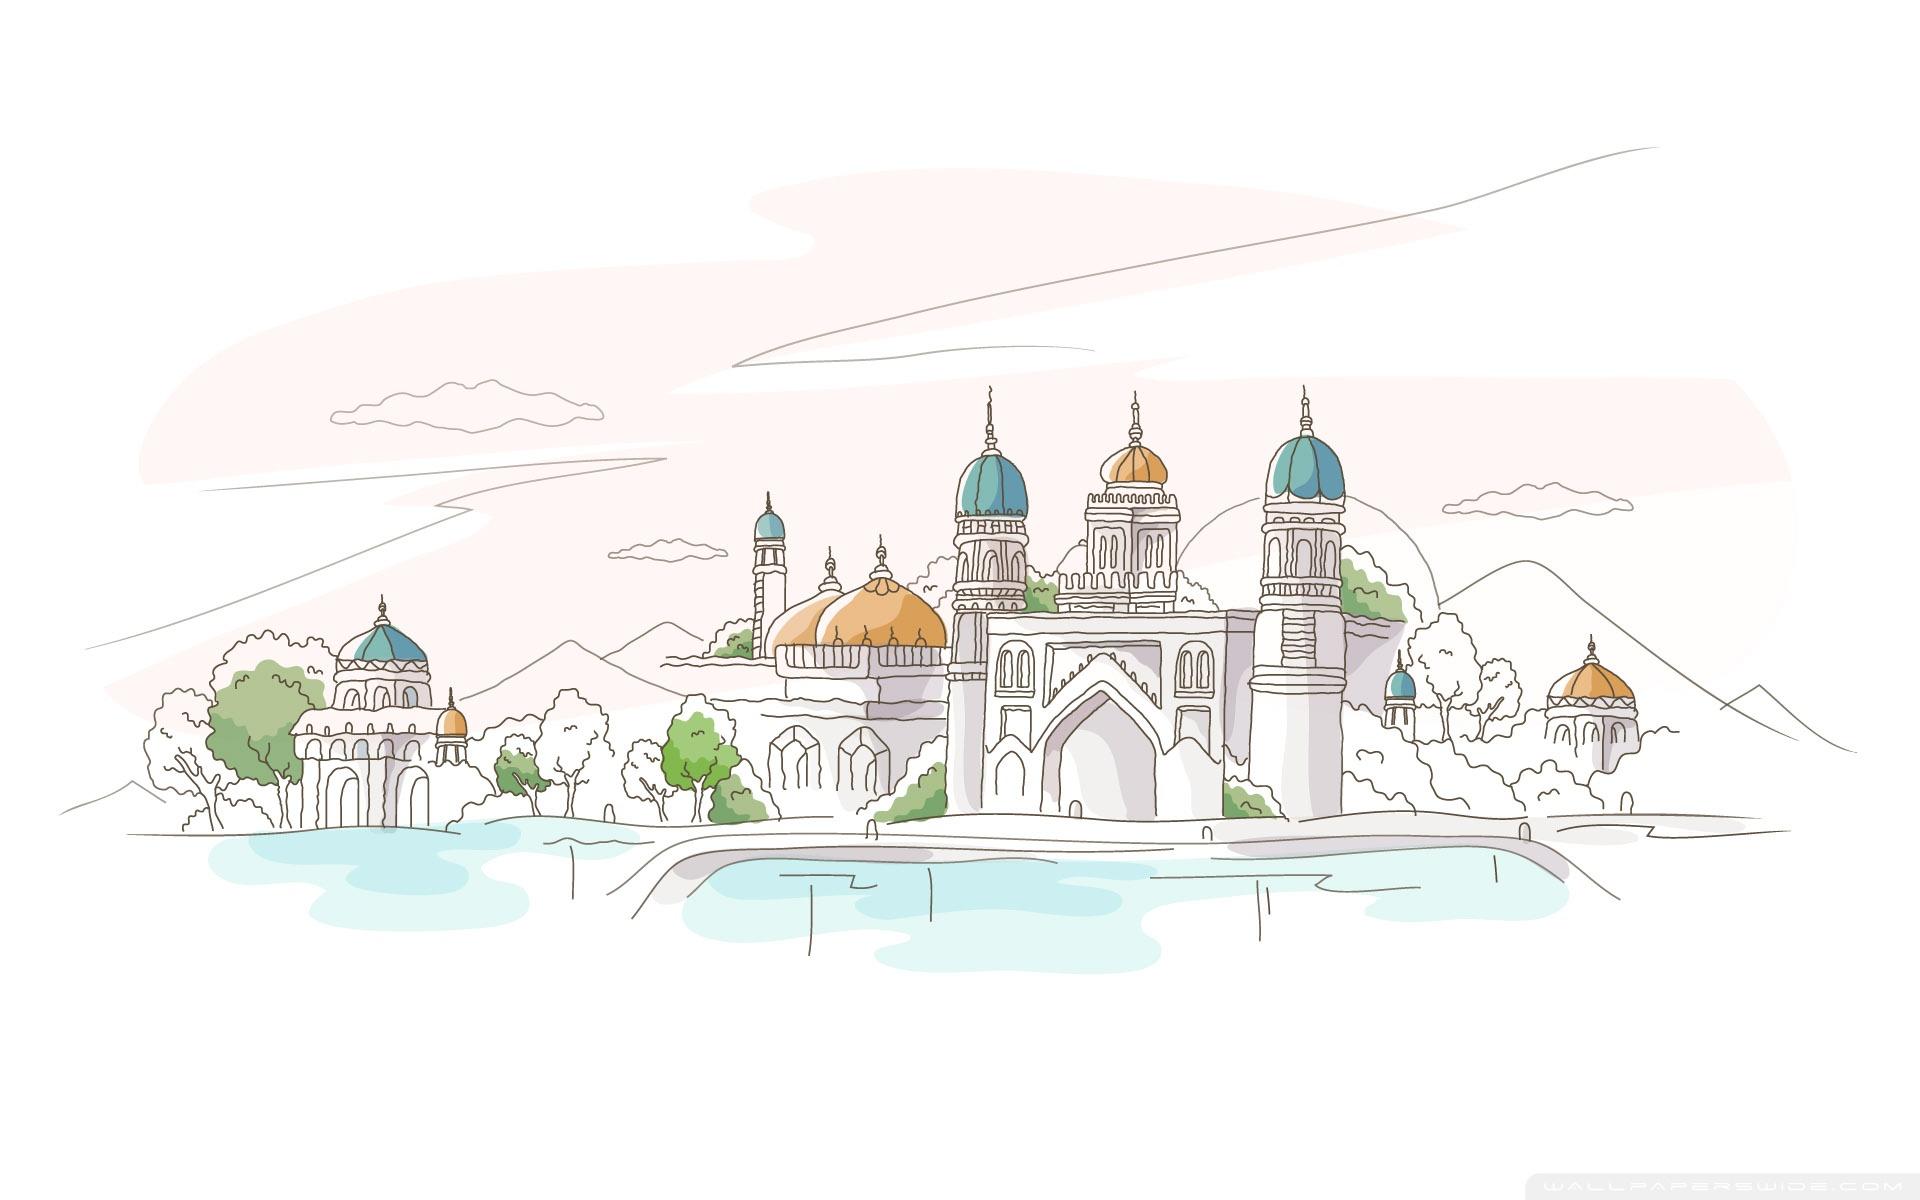 Cute Paris Wallpaper For Ipad Travel Illustrations Ultra Hd Desktop Background Wallpaper